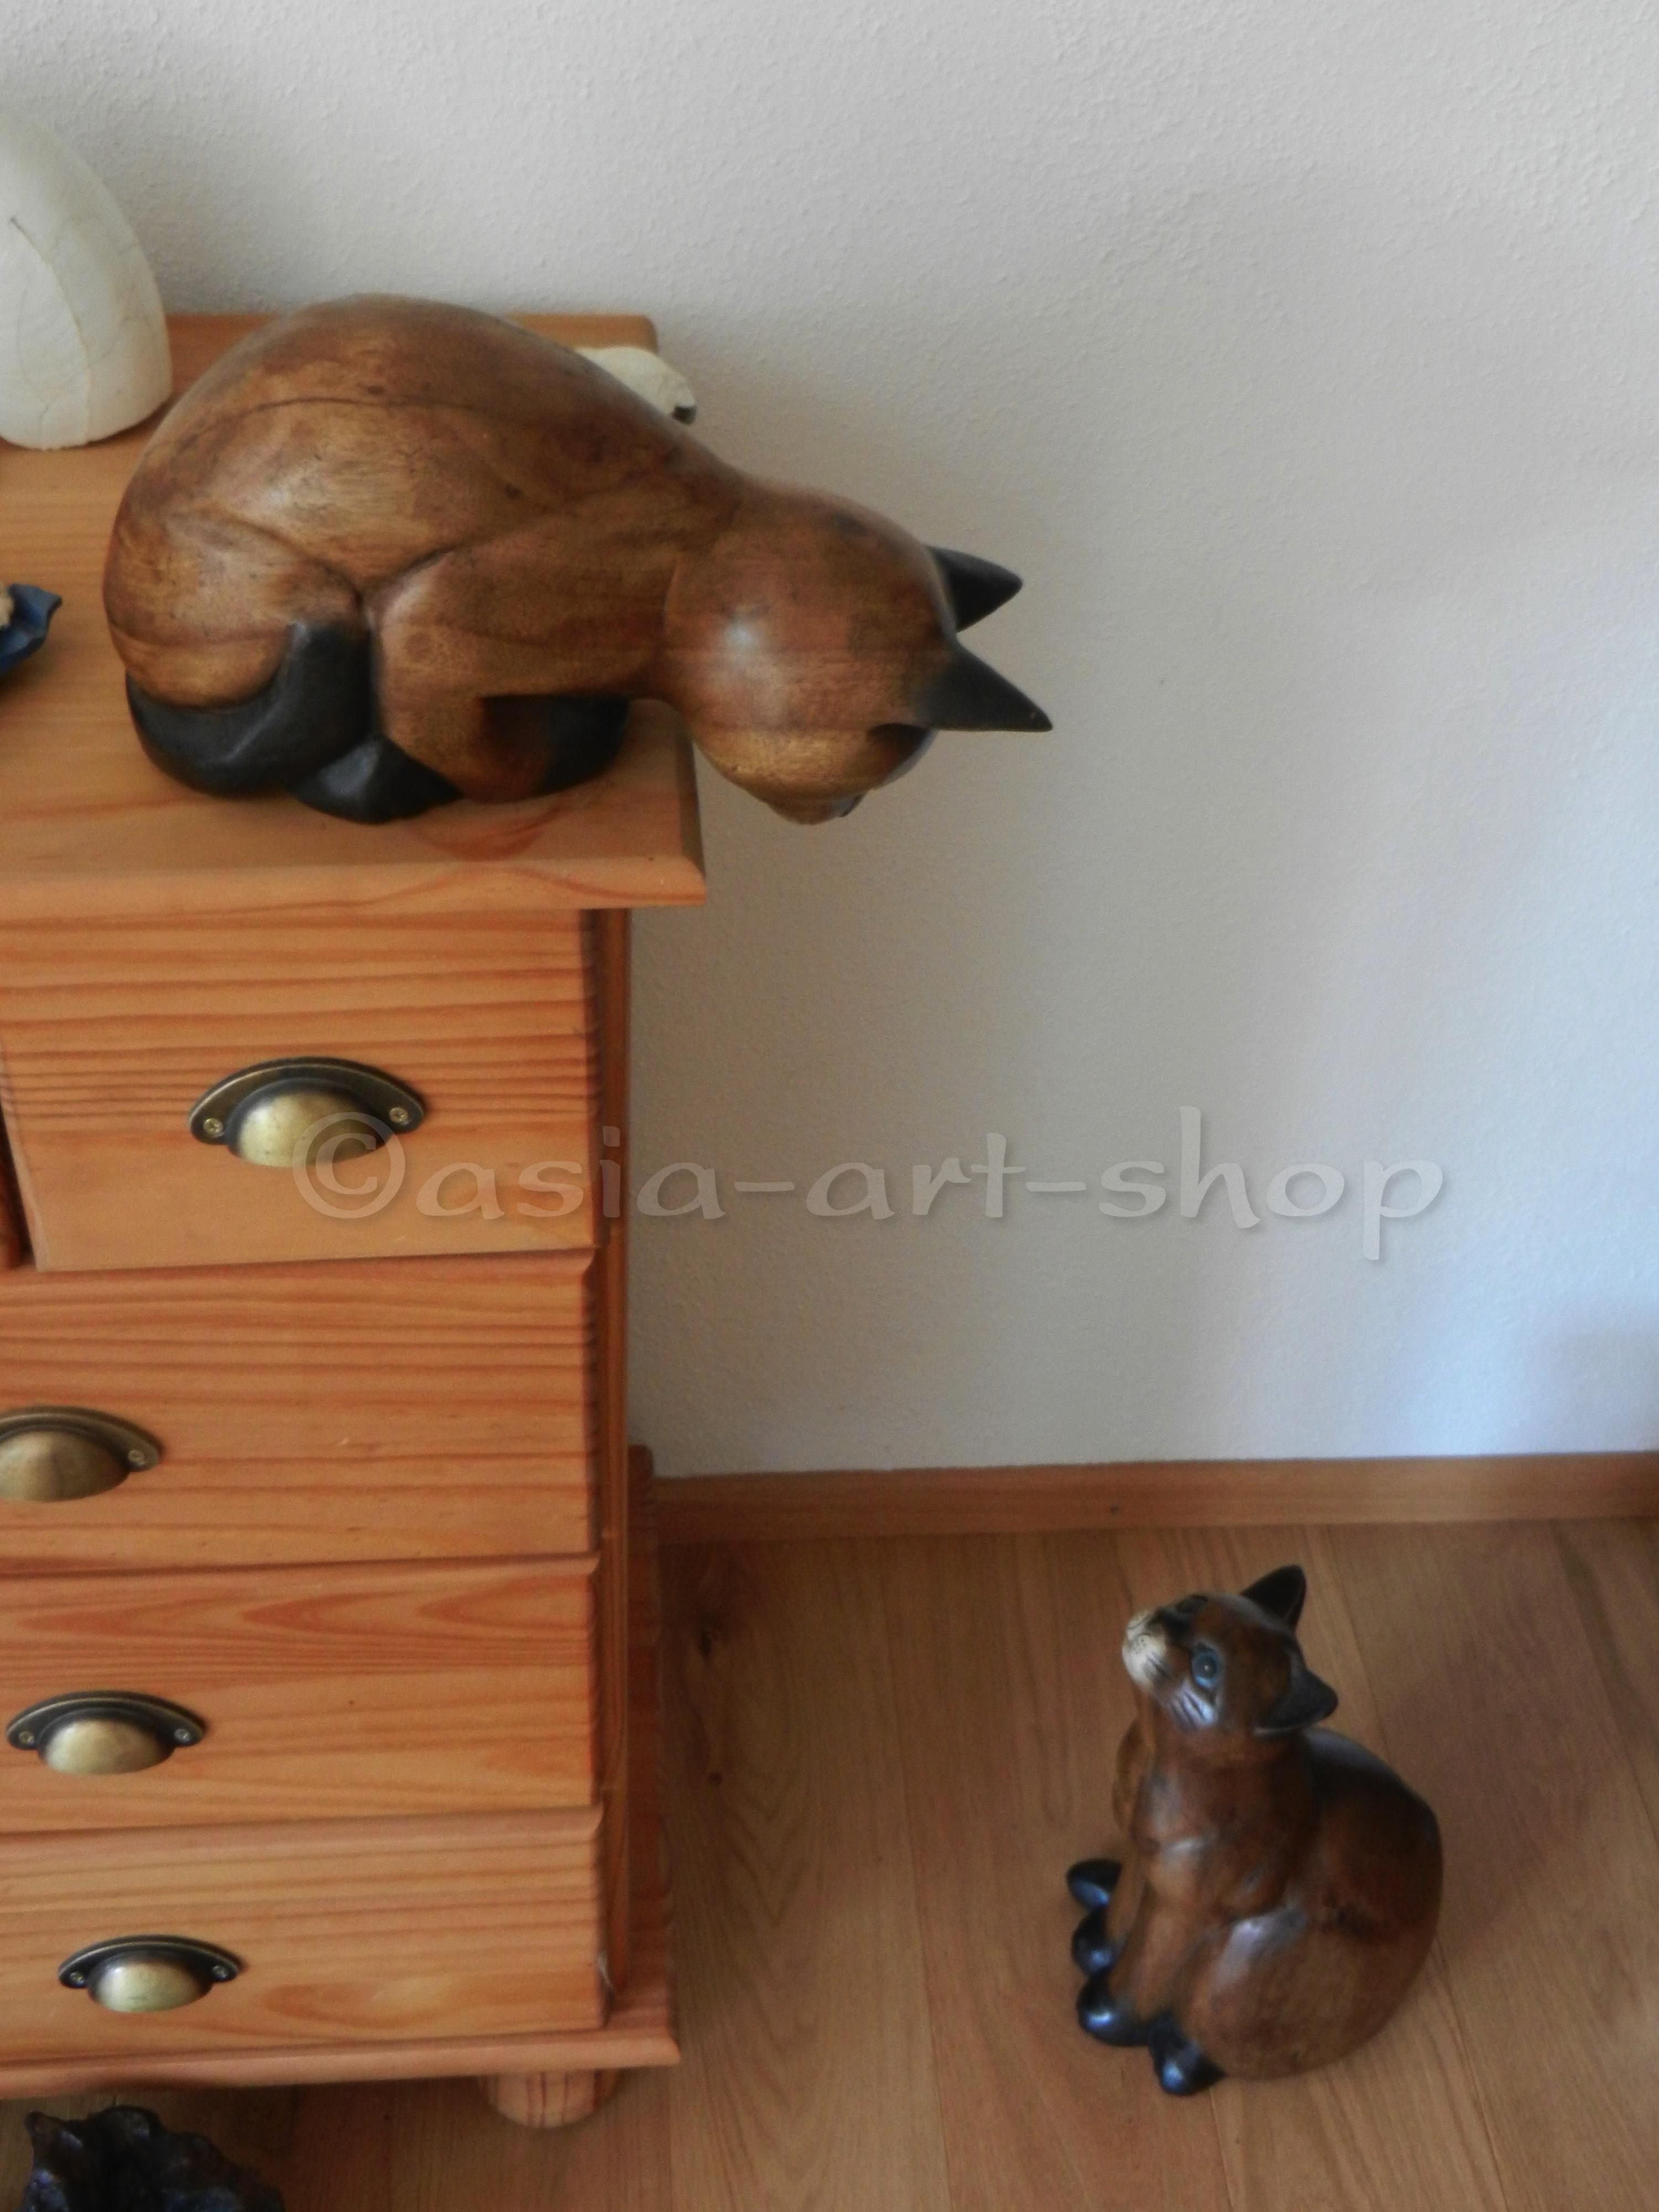 katze aus holz handgeschnitzt asia art shop. Black Bedroom Furniture Sets. Home Design Ideas